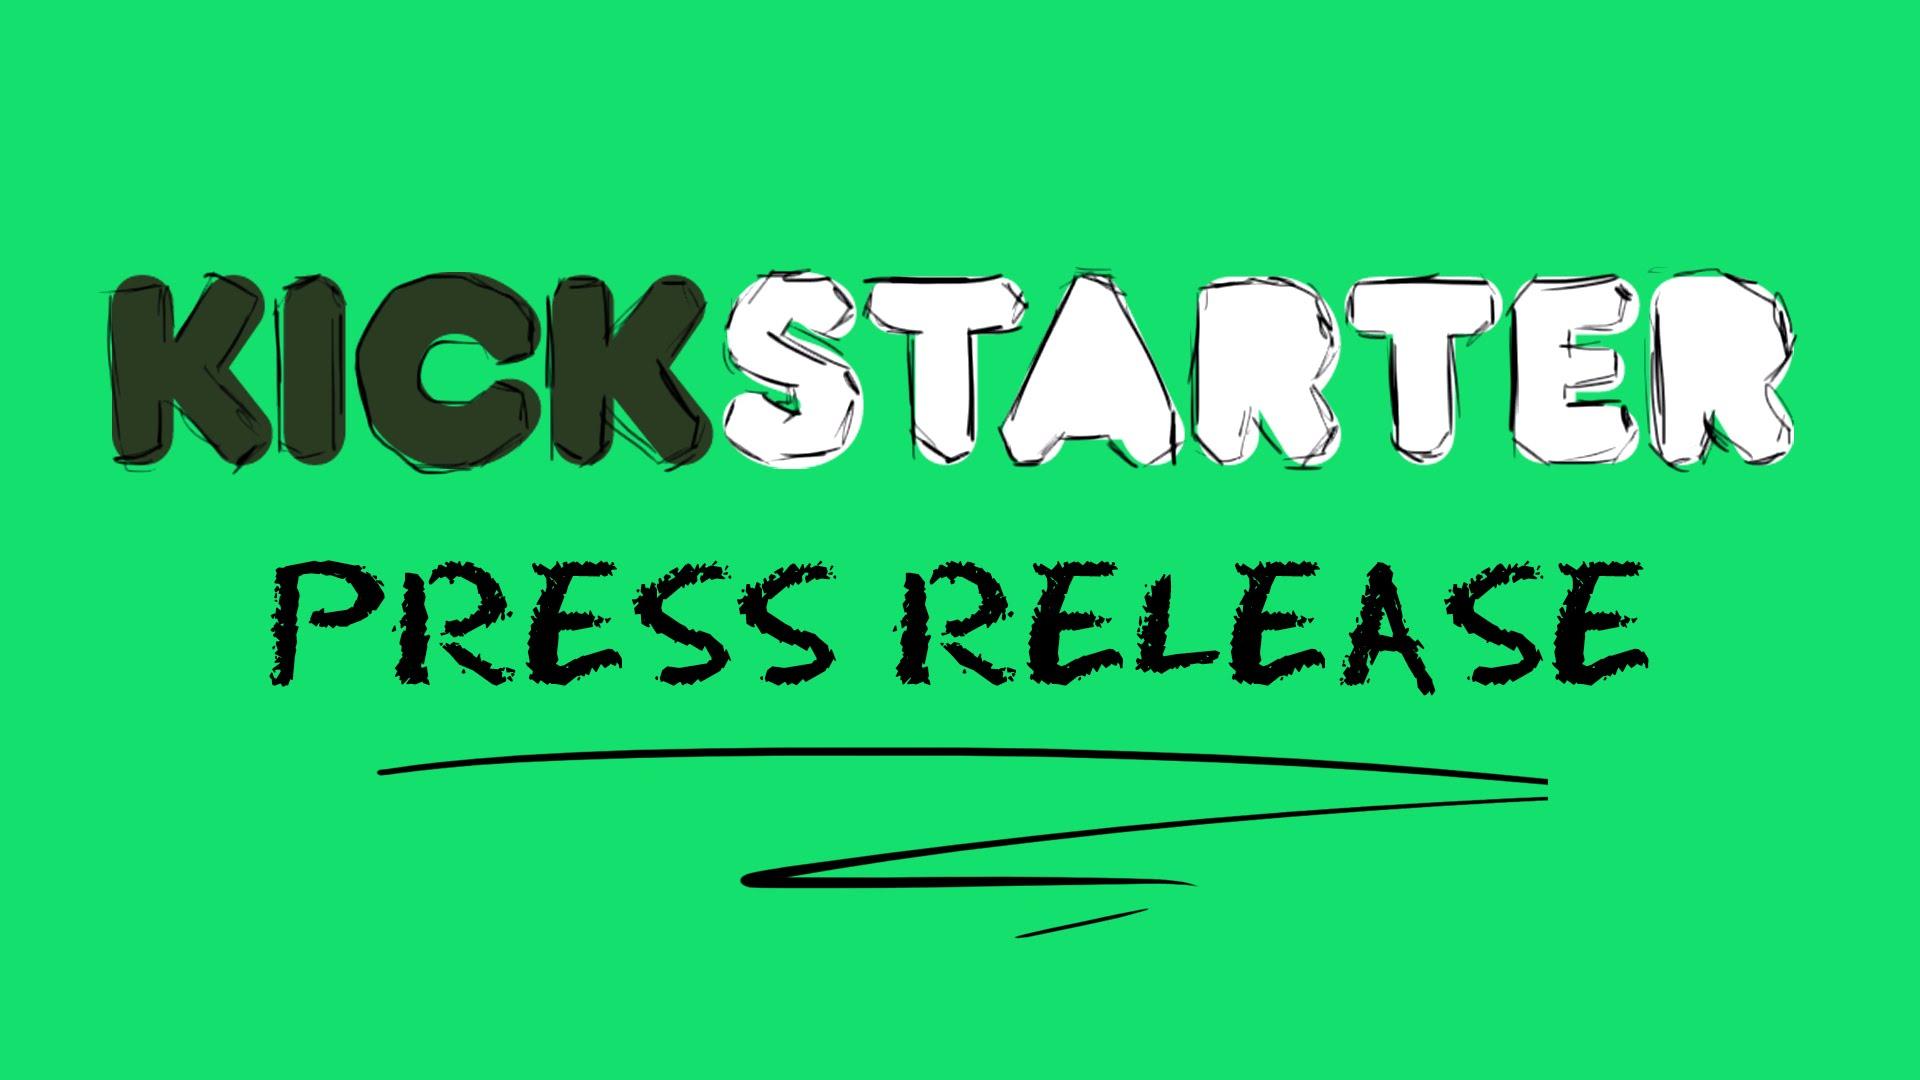 Publication of Kickstarter Press Release Examples From Triumphant Kickstarters Campaign